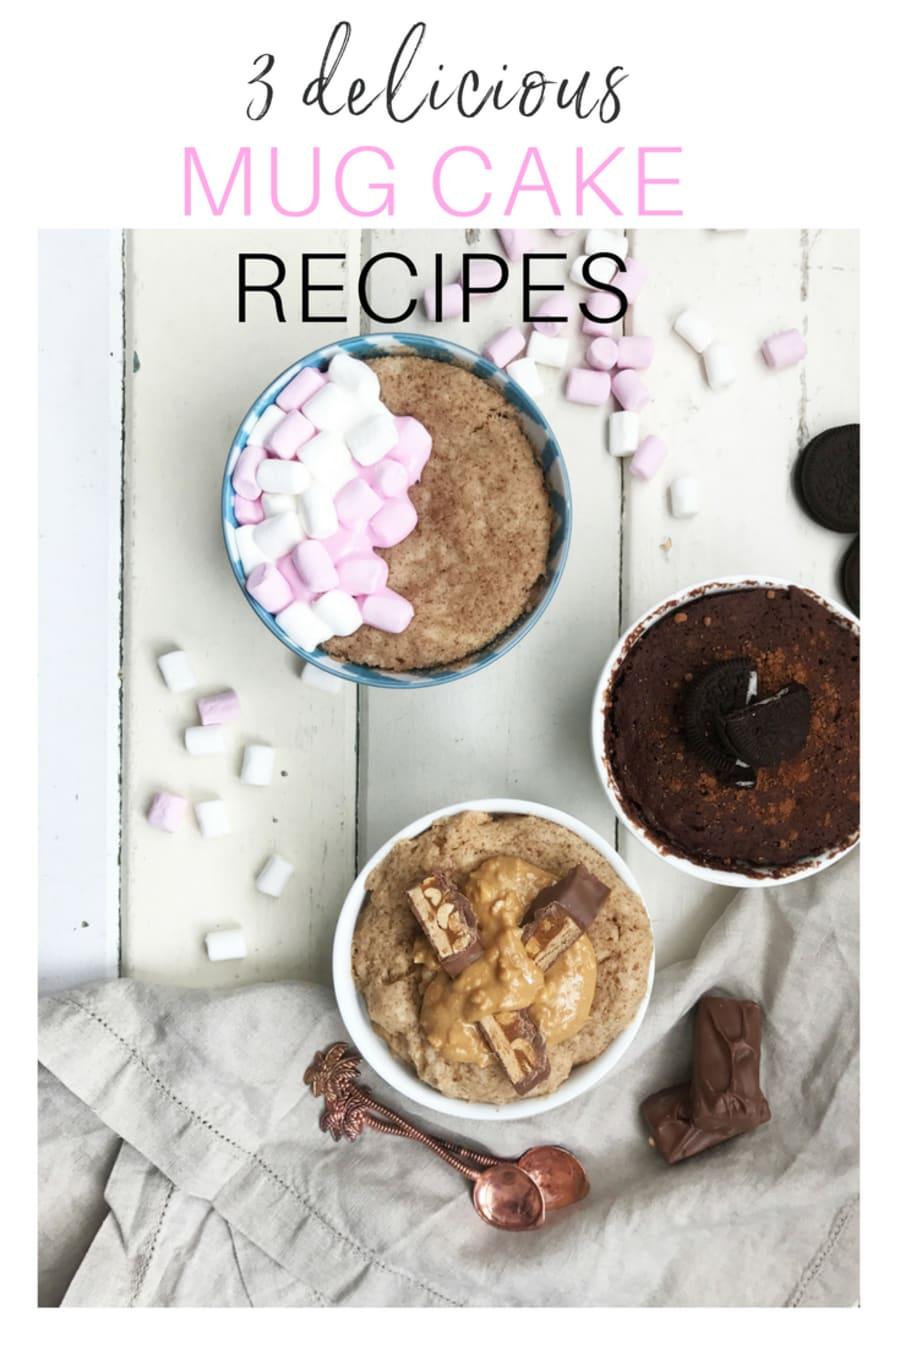 How To Make Mug Cake 3